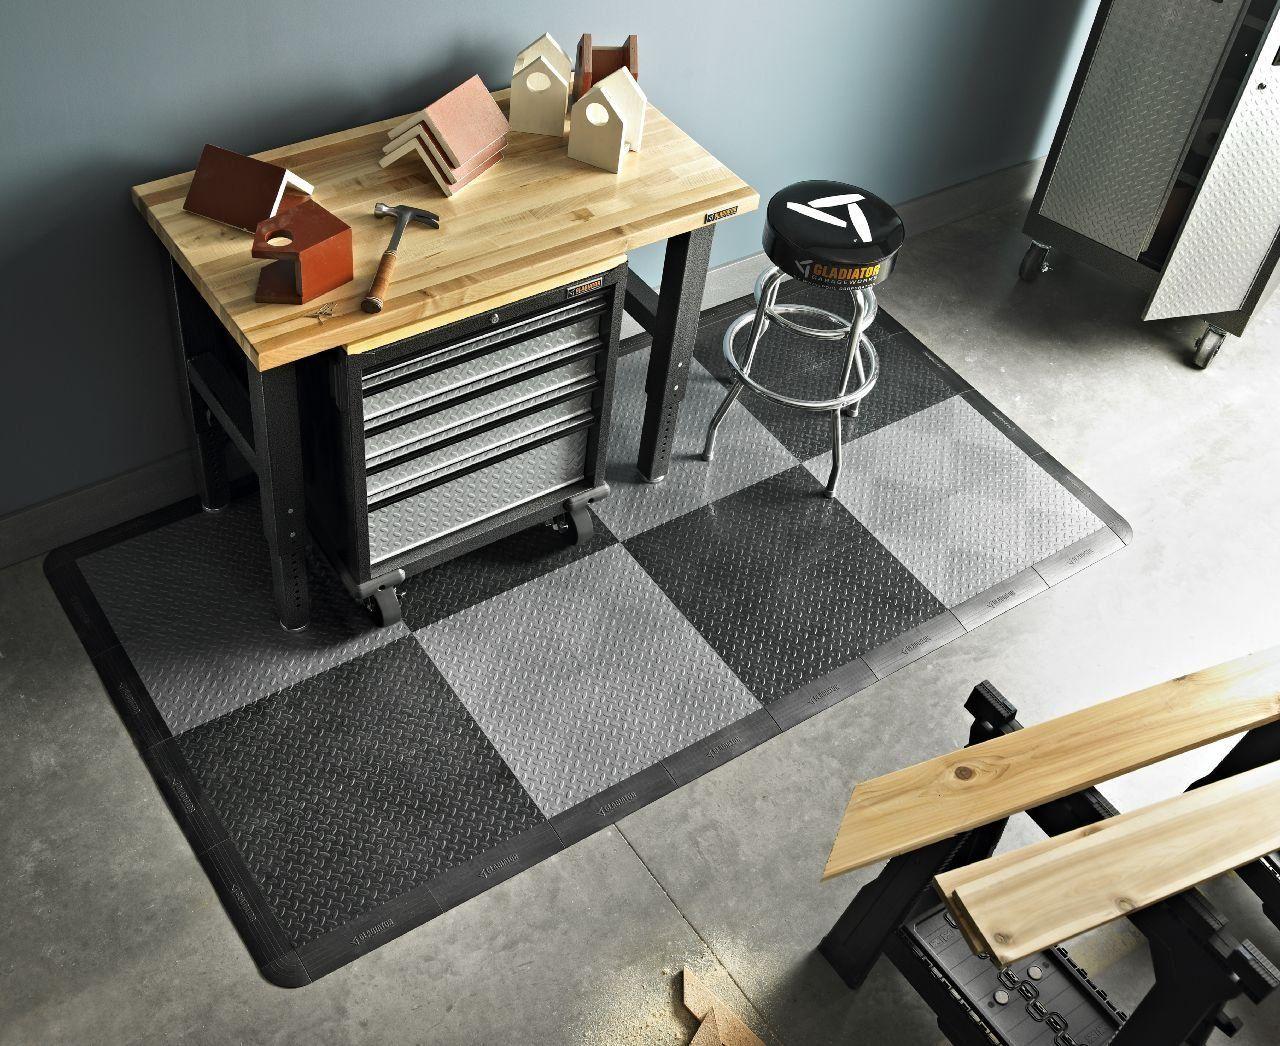 Like this customizable padded floor pad kitadiator gafp32cbzm like this customizable padded floor pad kitadiator floor pad kit blacksilver home improvement dailygadgetfo Gallery